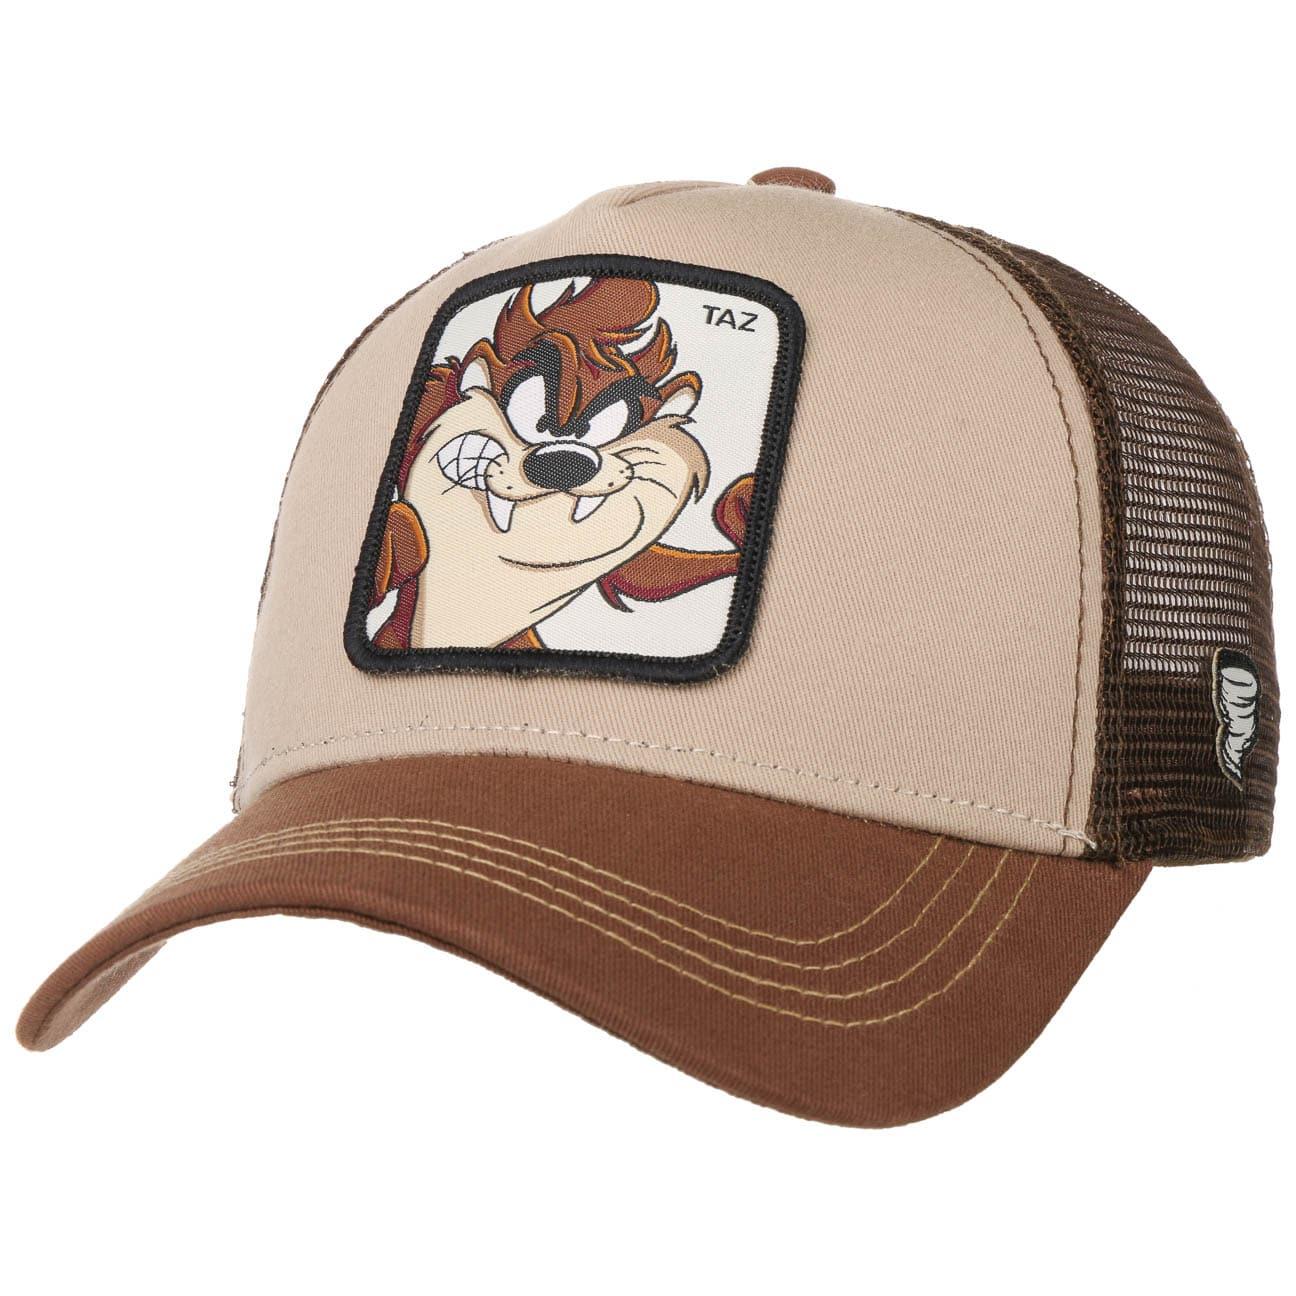 Gorra Trucker Looney Taz 2 by Capslab